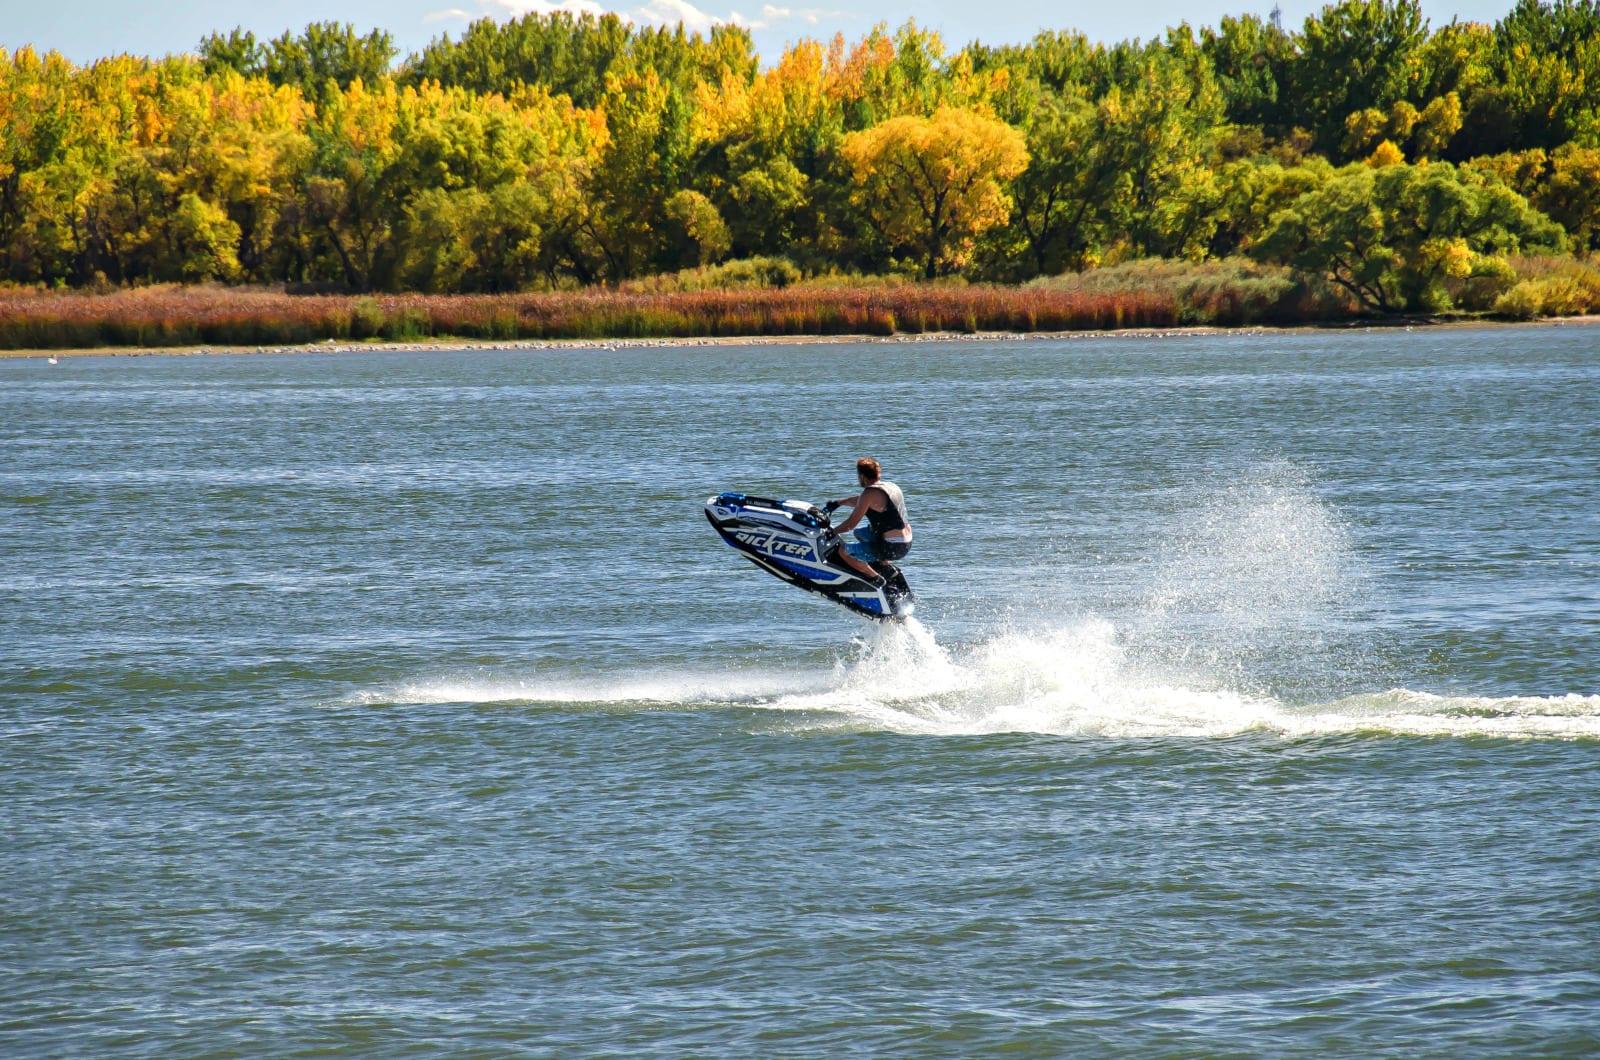 Colorado Watersports Jet Skiing Cherry Creek Reservoir